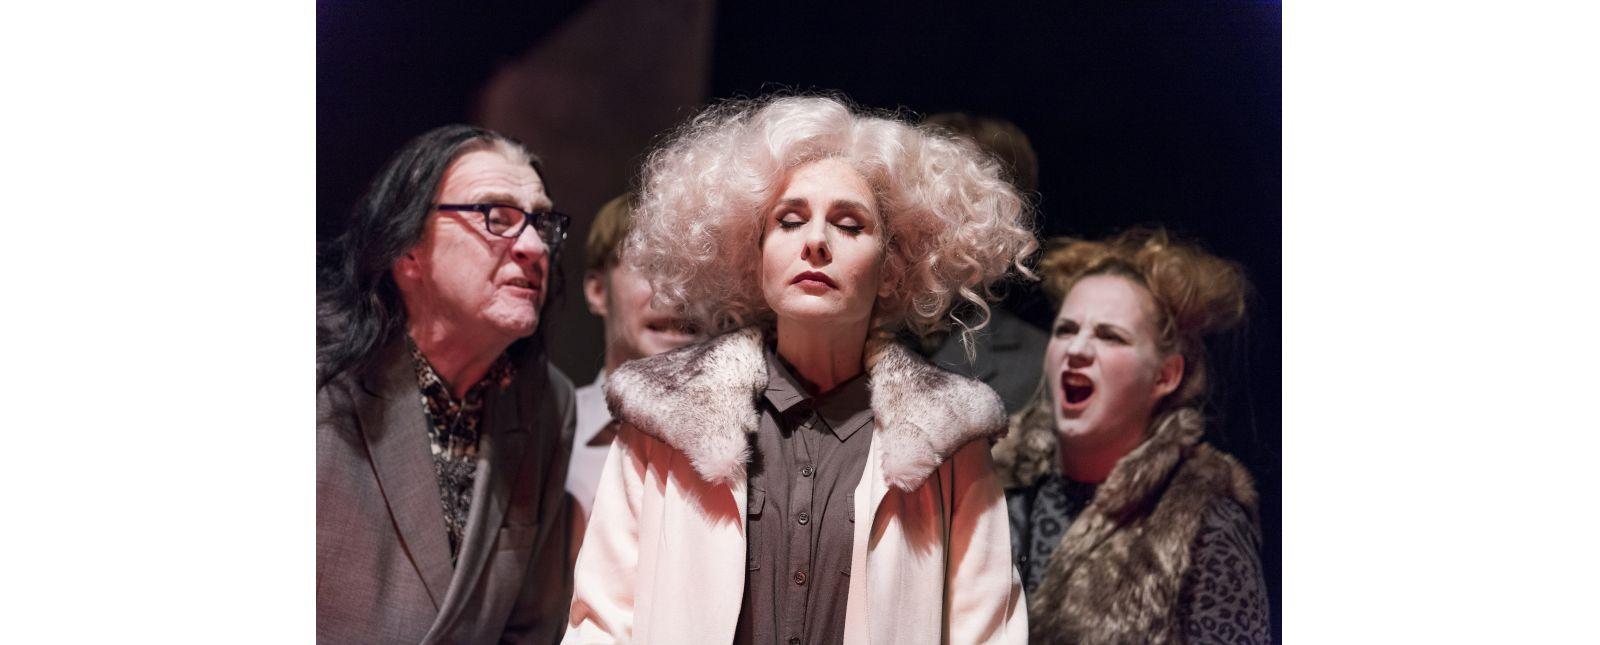 Der Tempelherr // Hartmut Stanke / Angela Falkenhan / Marieke Kregel // 2019 // Marc Doradzillo